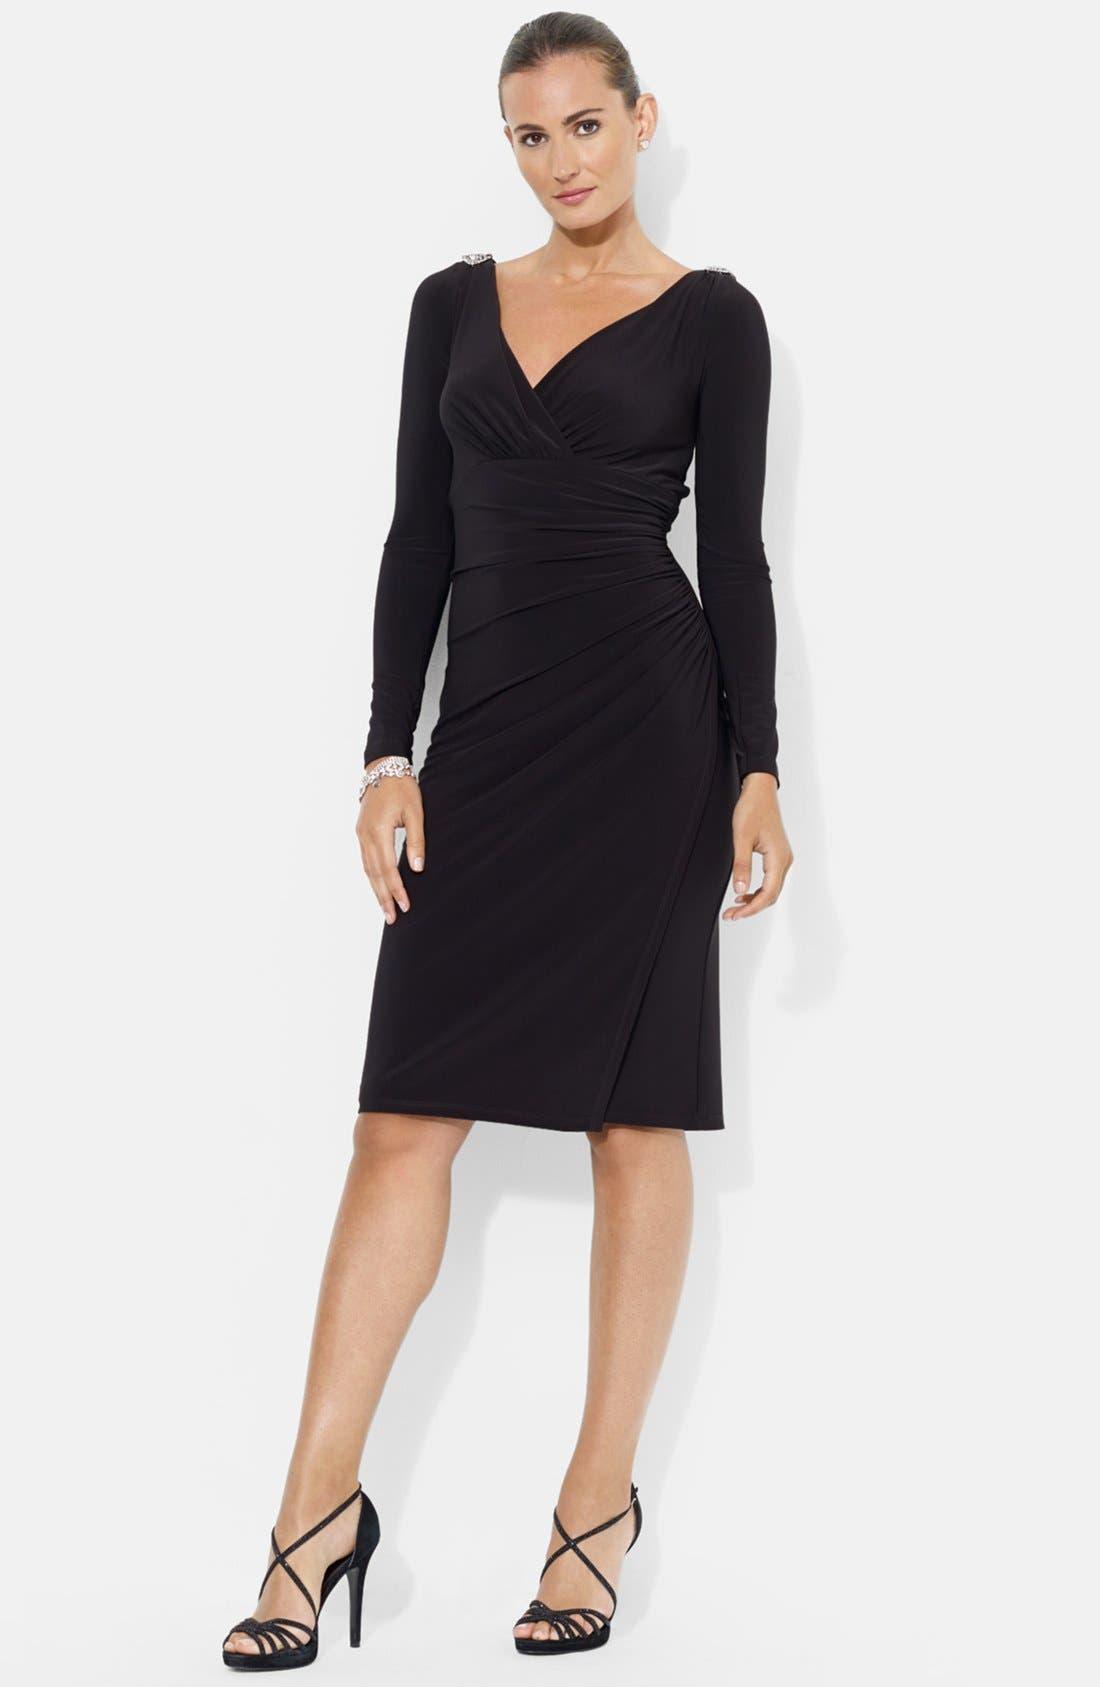 Alternate Image 1 Selected - Lauren Ralph Lauren Embellished Shoulder Jersey Dress (Petite)